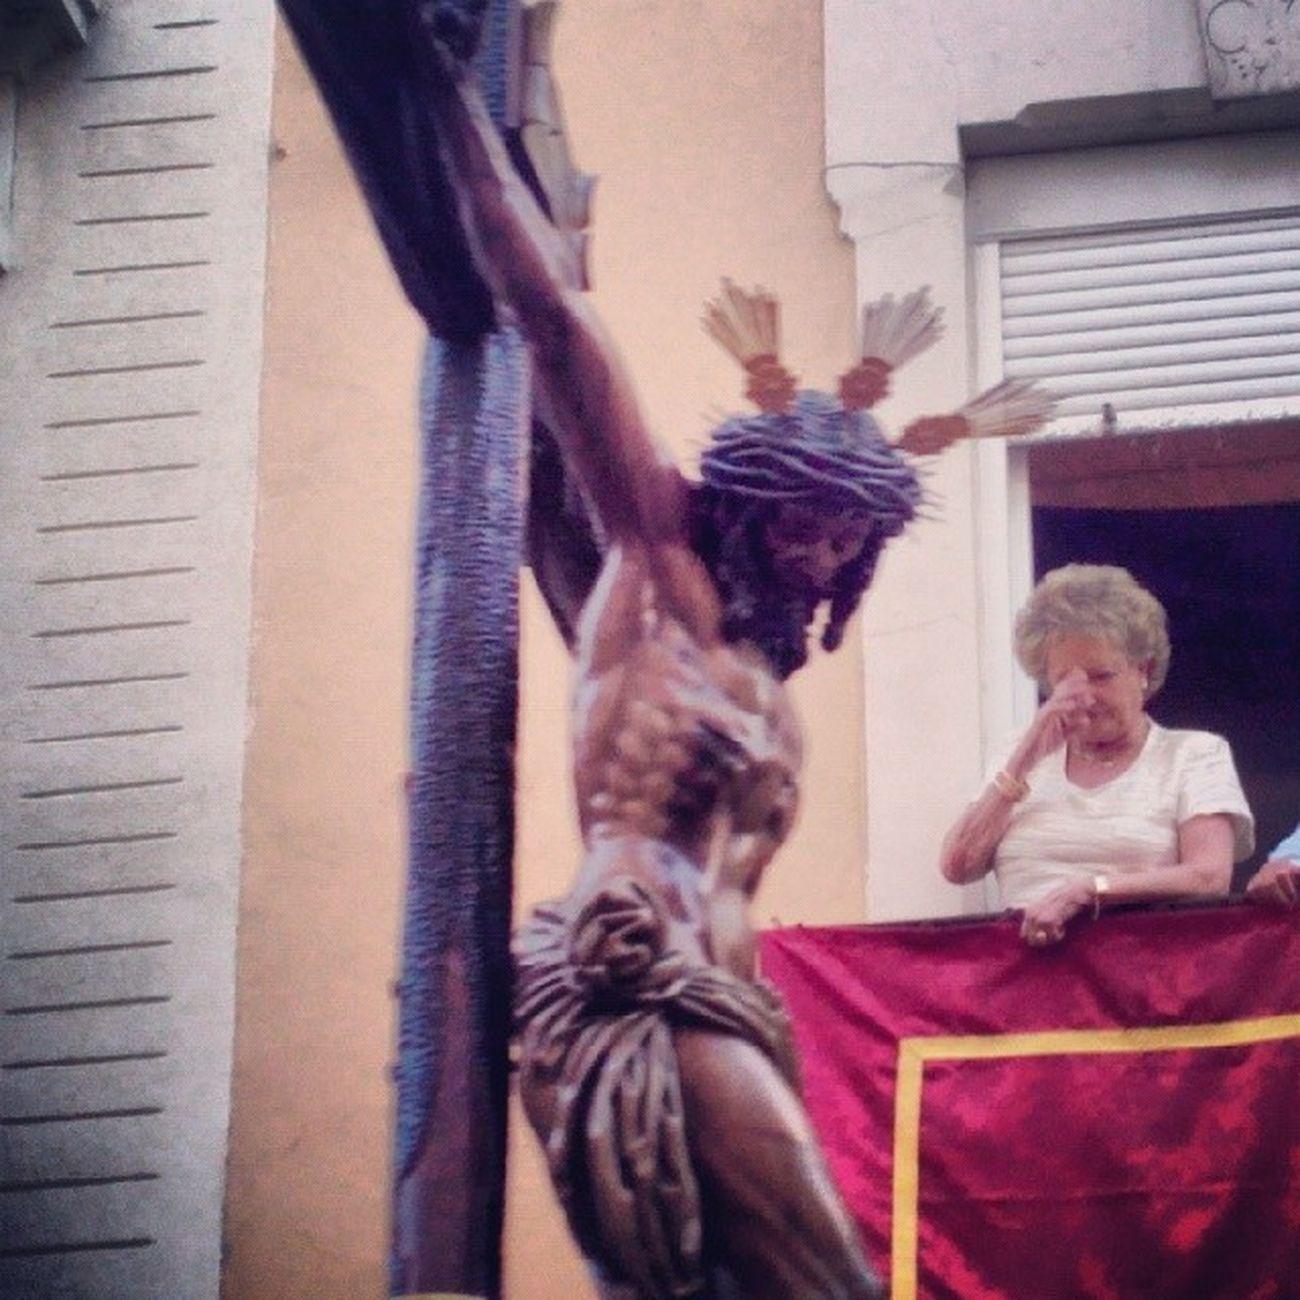 Devoción al Cristo de la Sangre SanBenito Ssanta14 Sevsanta14 Semanasantasevilla